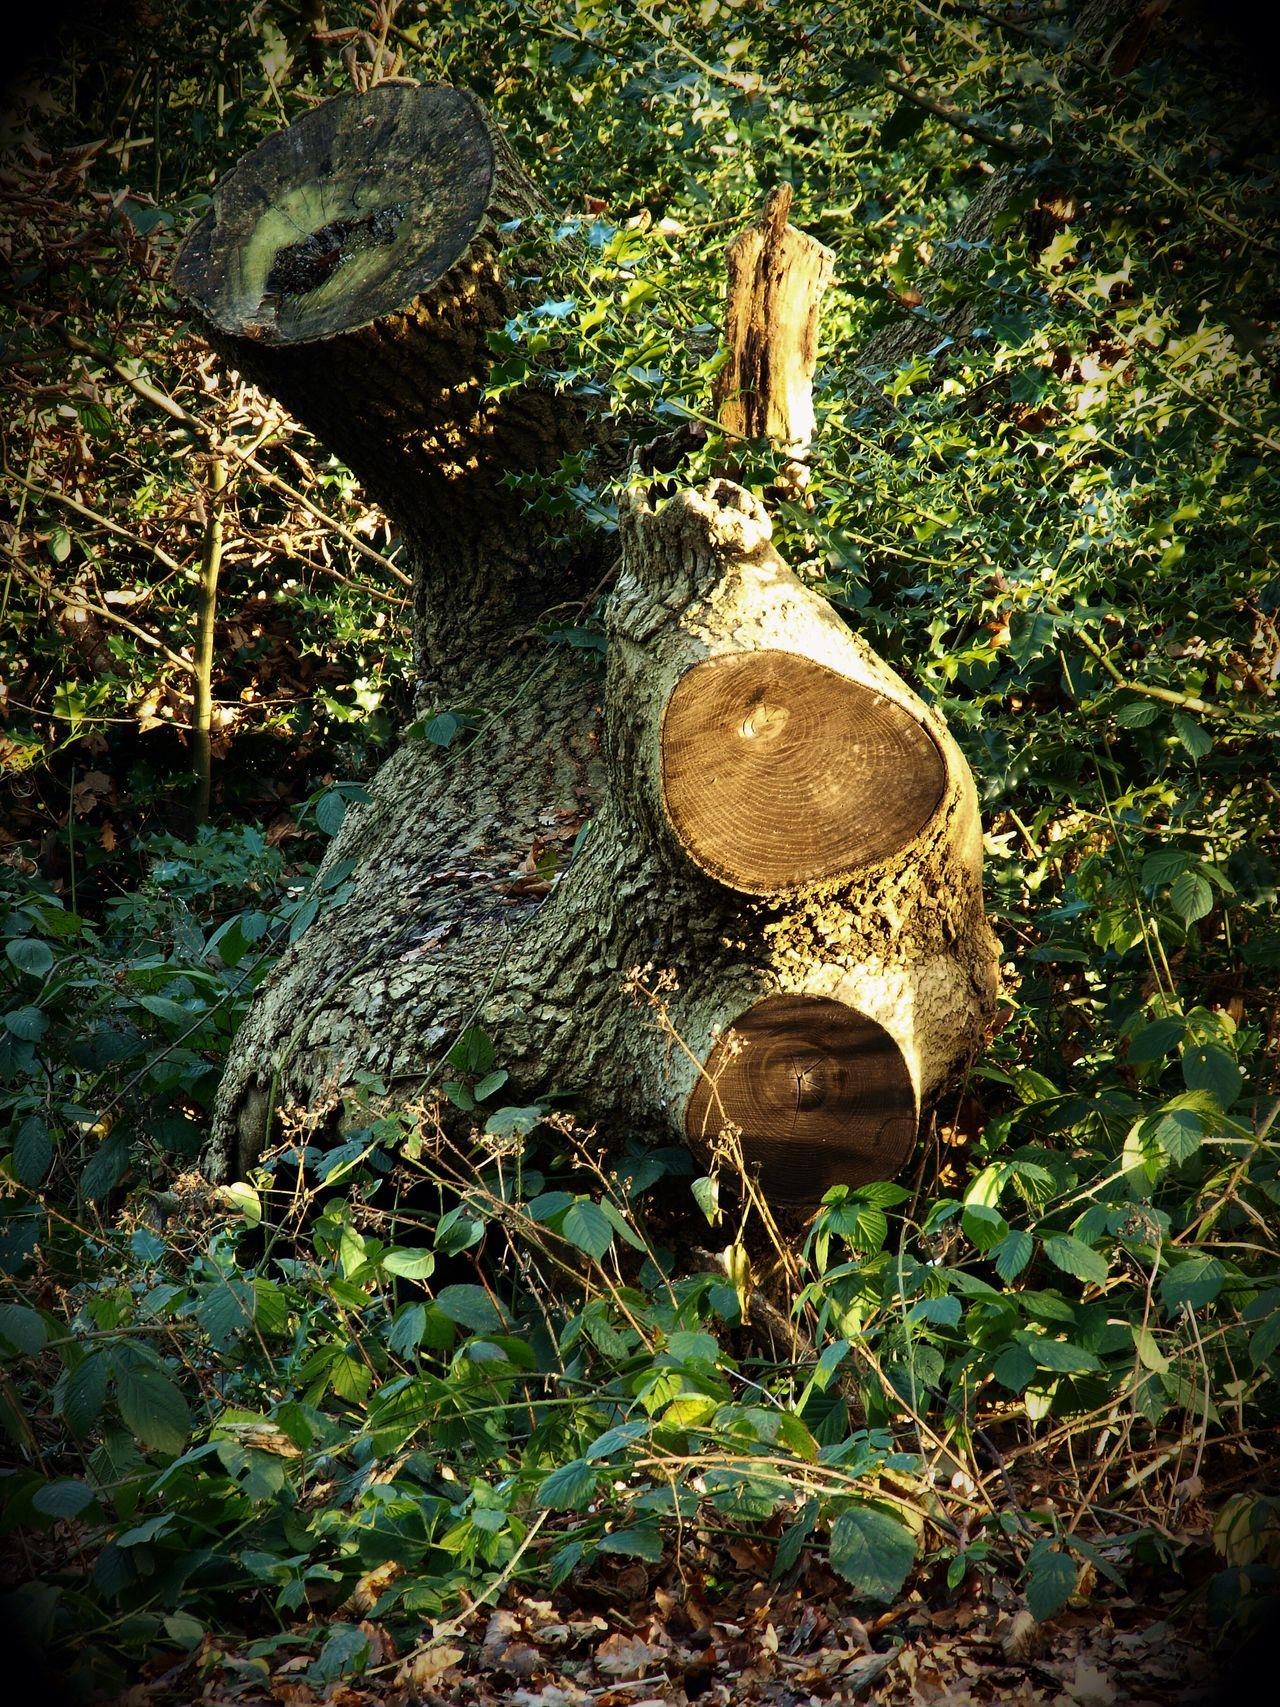 Steve Merrick No People Zuiko Trees Stevesevilempire TreePorn Tree Trunk Hampstead Heath Olympus London